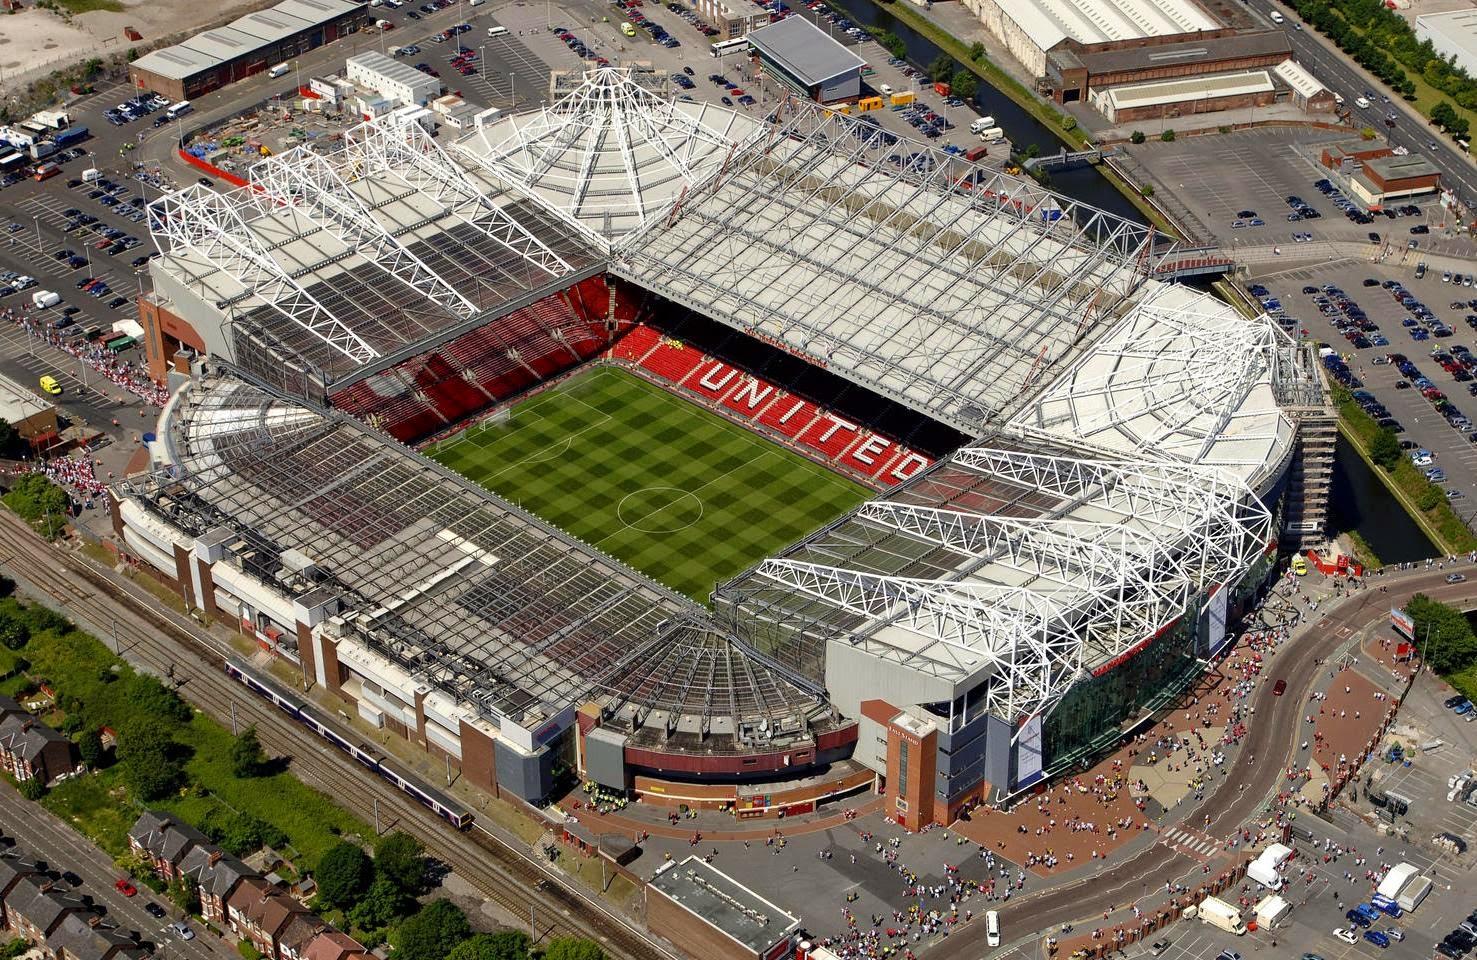 old_trafford stadium_manchester United